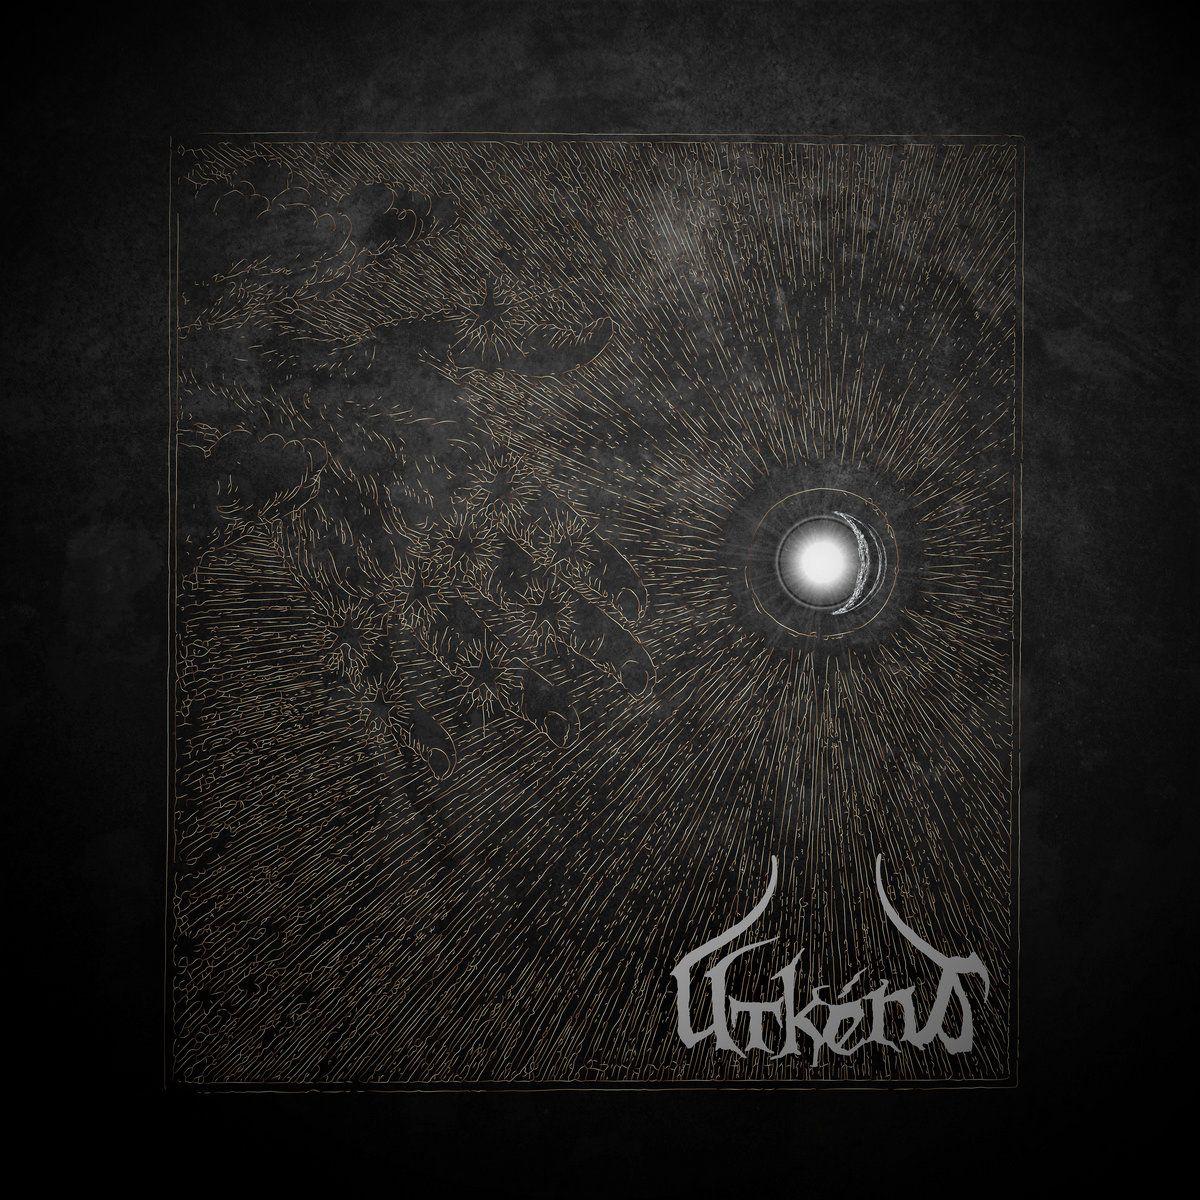 Utkena - The Firmament's Hand